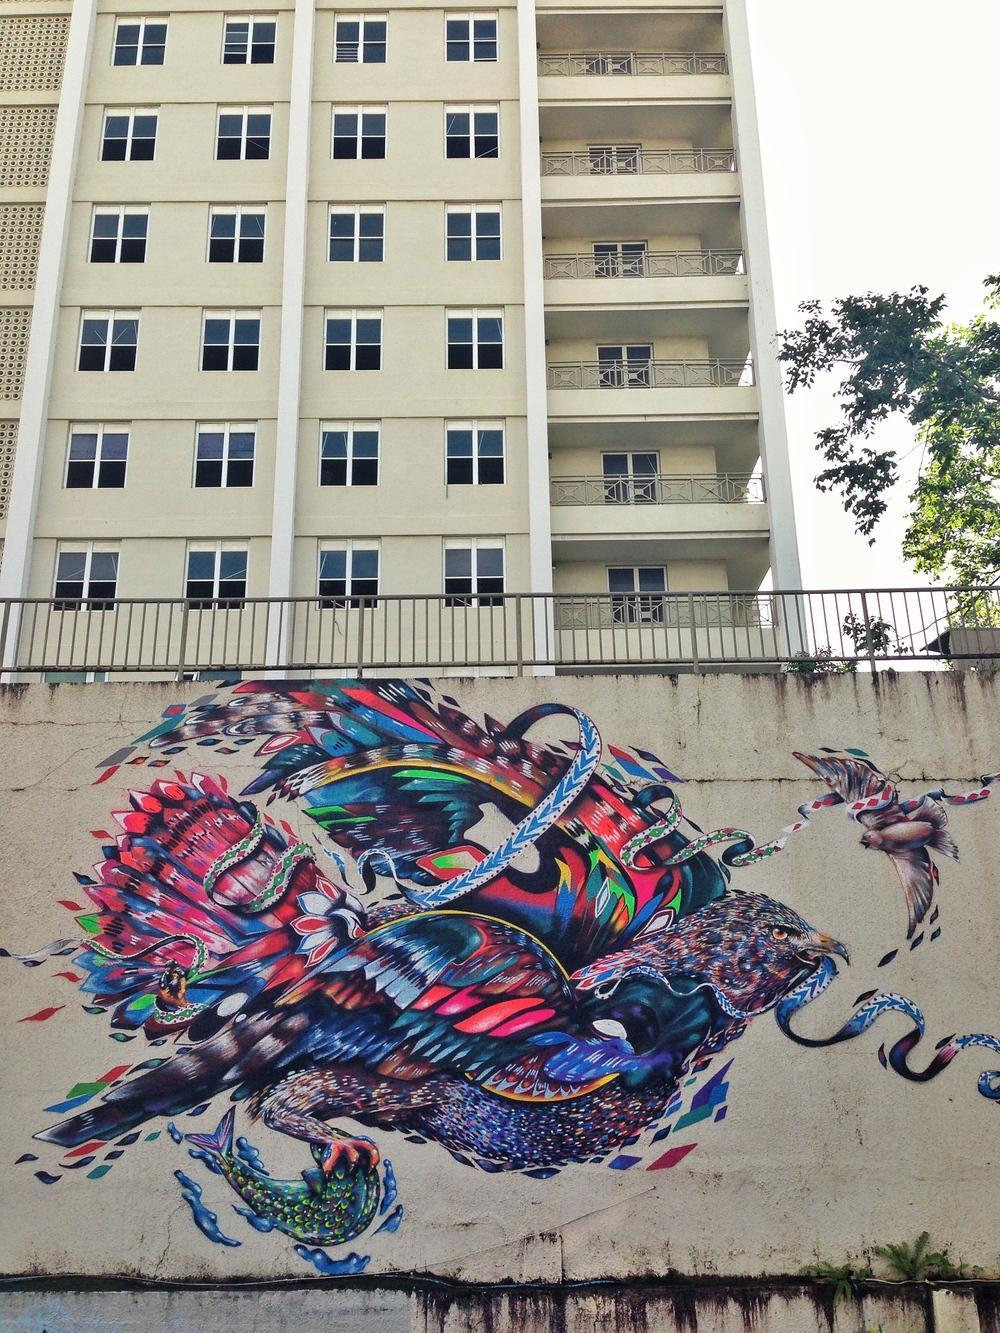 Large scale mural. San Juan (santurce). Puerto Rico 2013.Yatika Starr Fields